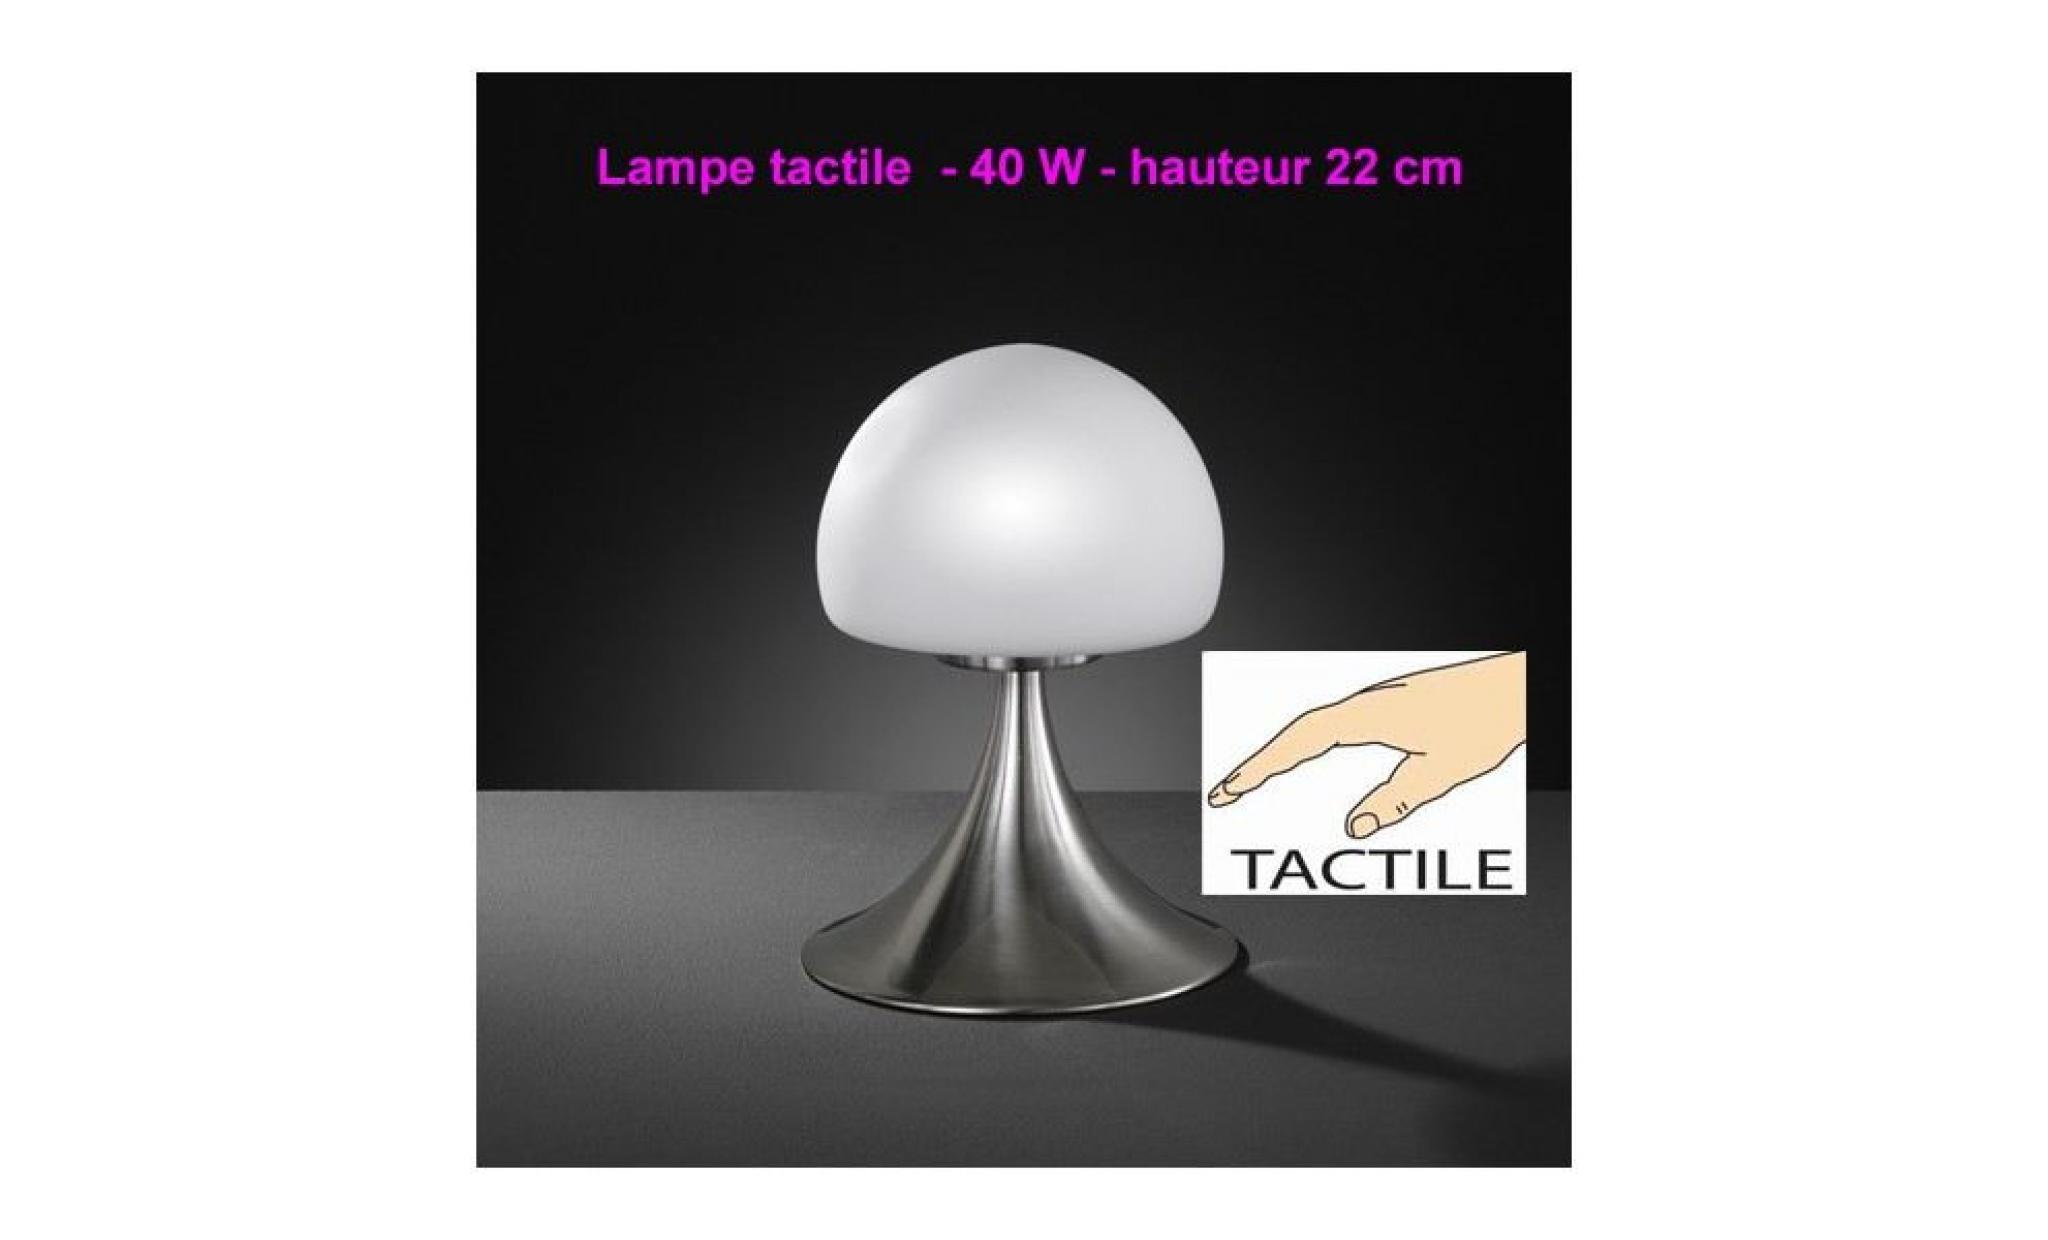 Tactile Tactile Chevet Chevet Caresse Caresse Chevet Lampe Lampe Tactile Chevet Lampe Tactile Caresse Lampe j3L4RA5